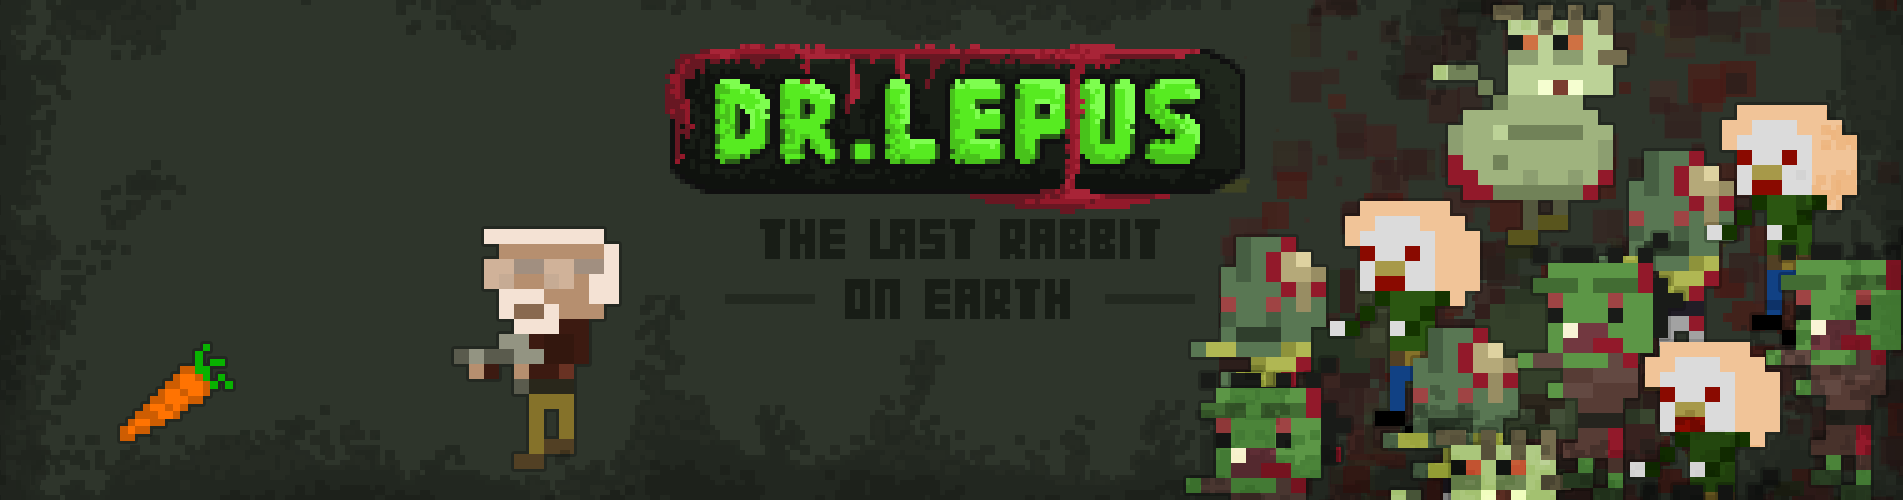 DR. LEPUS pixelart zombie shooter